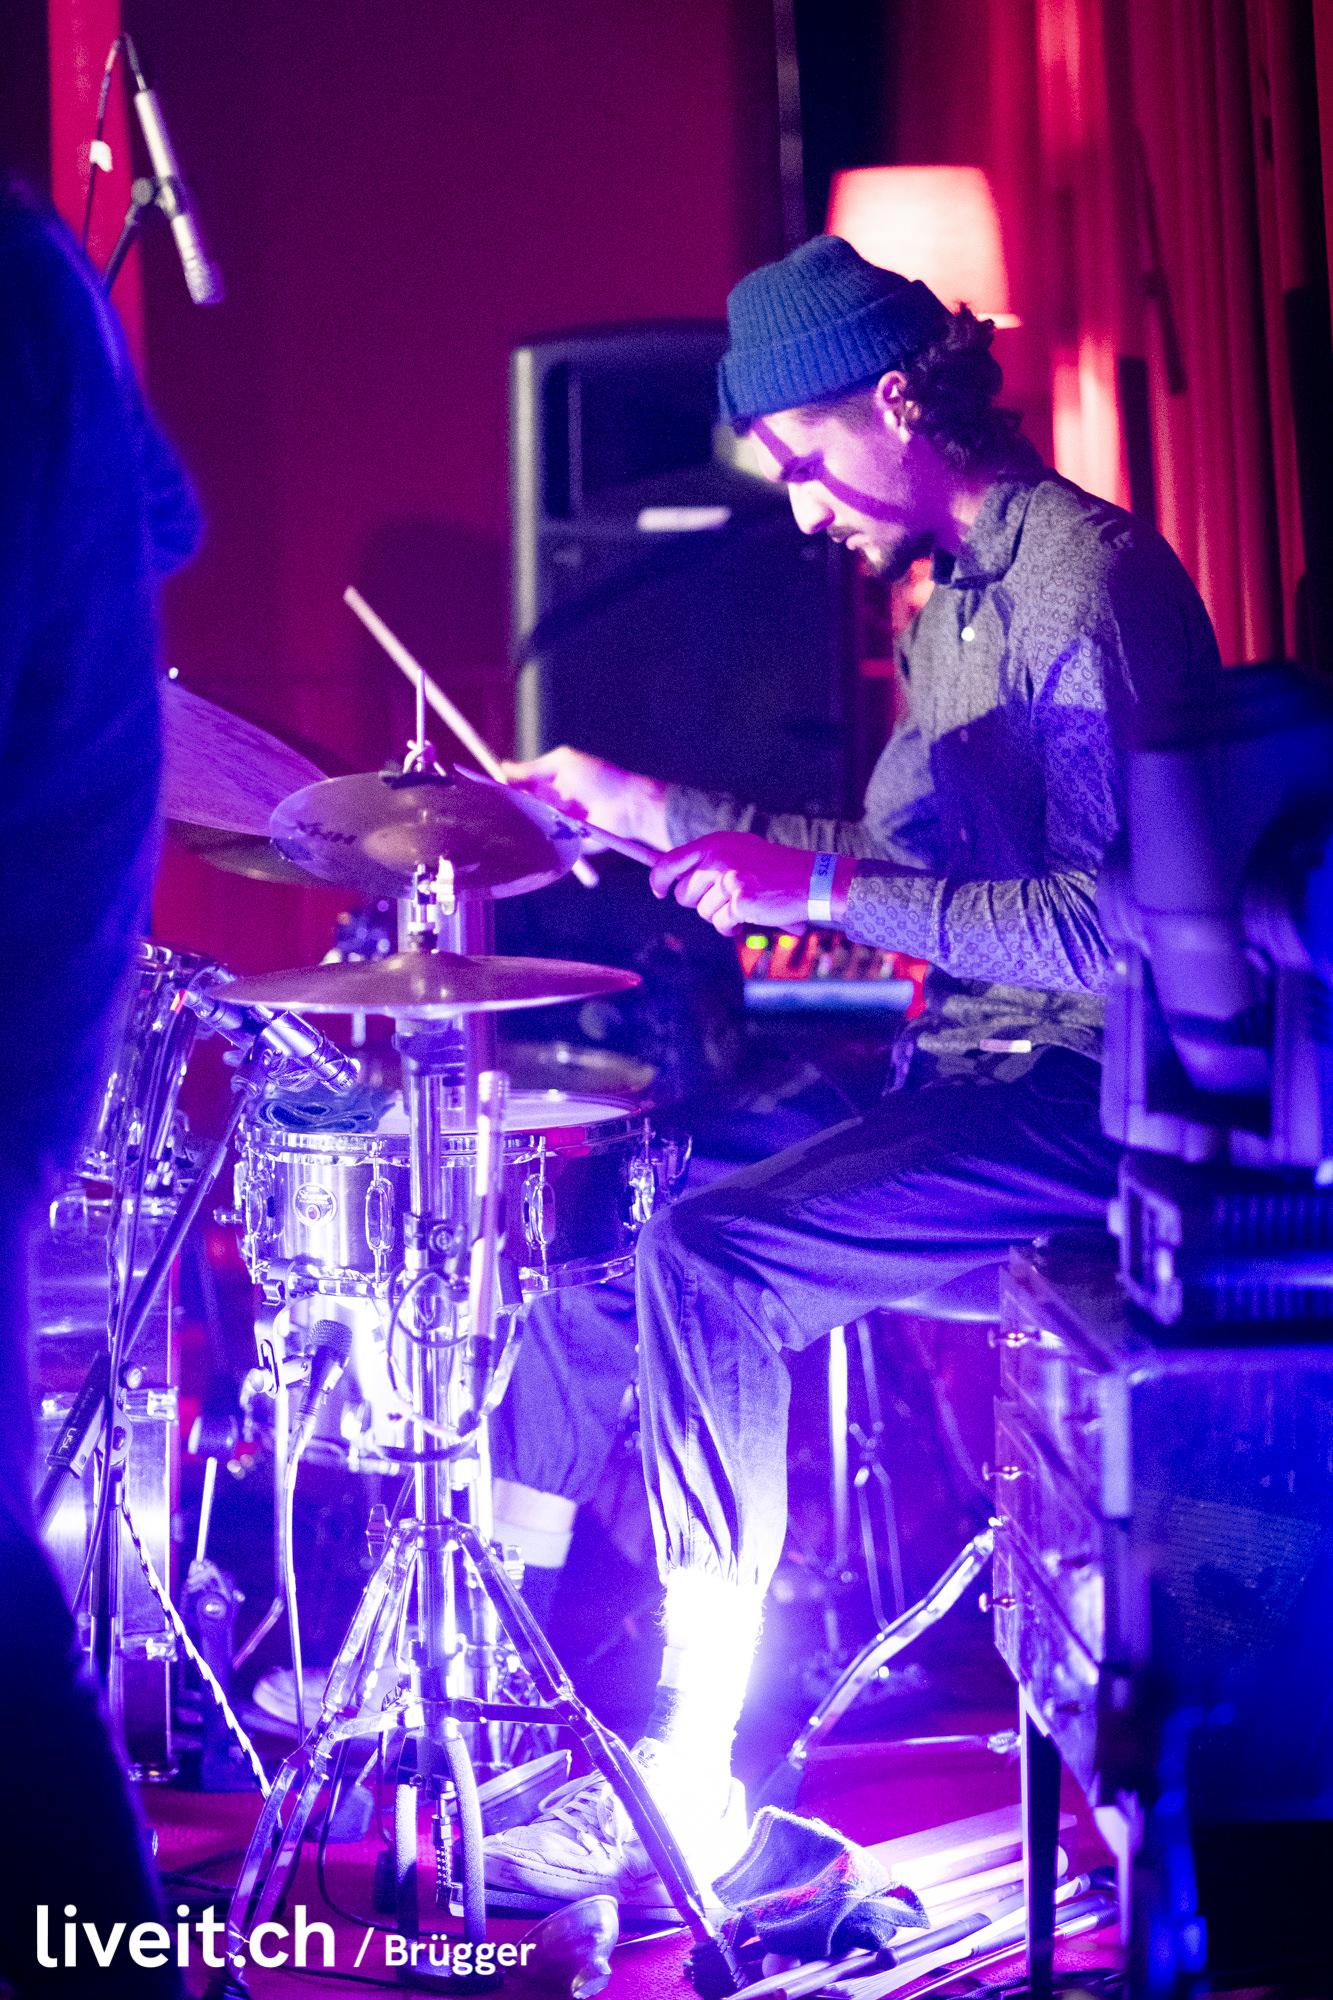 SCHWEIZ MUMA 2019 SWISS LIVE TALENTS MUSIC MARATHON